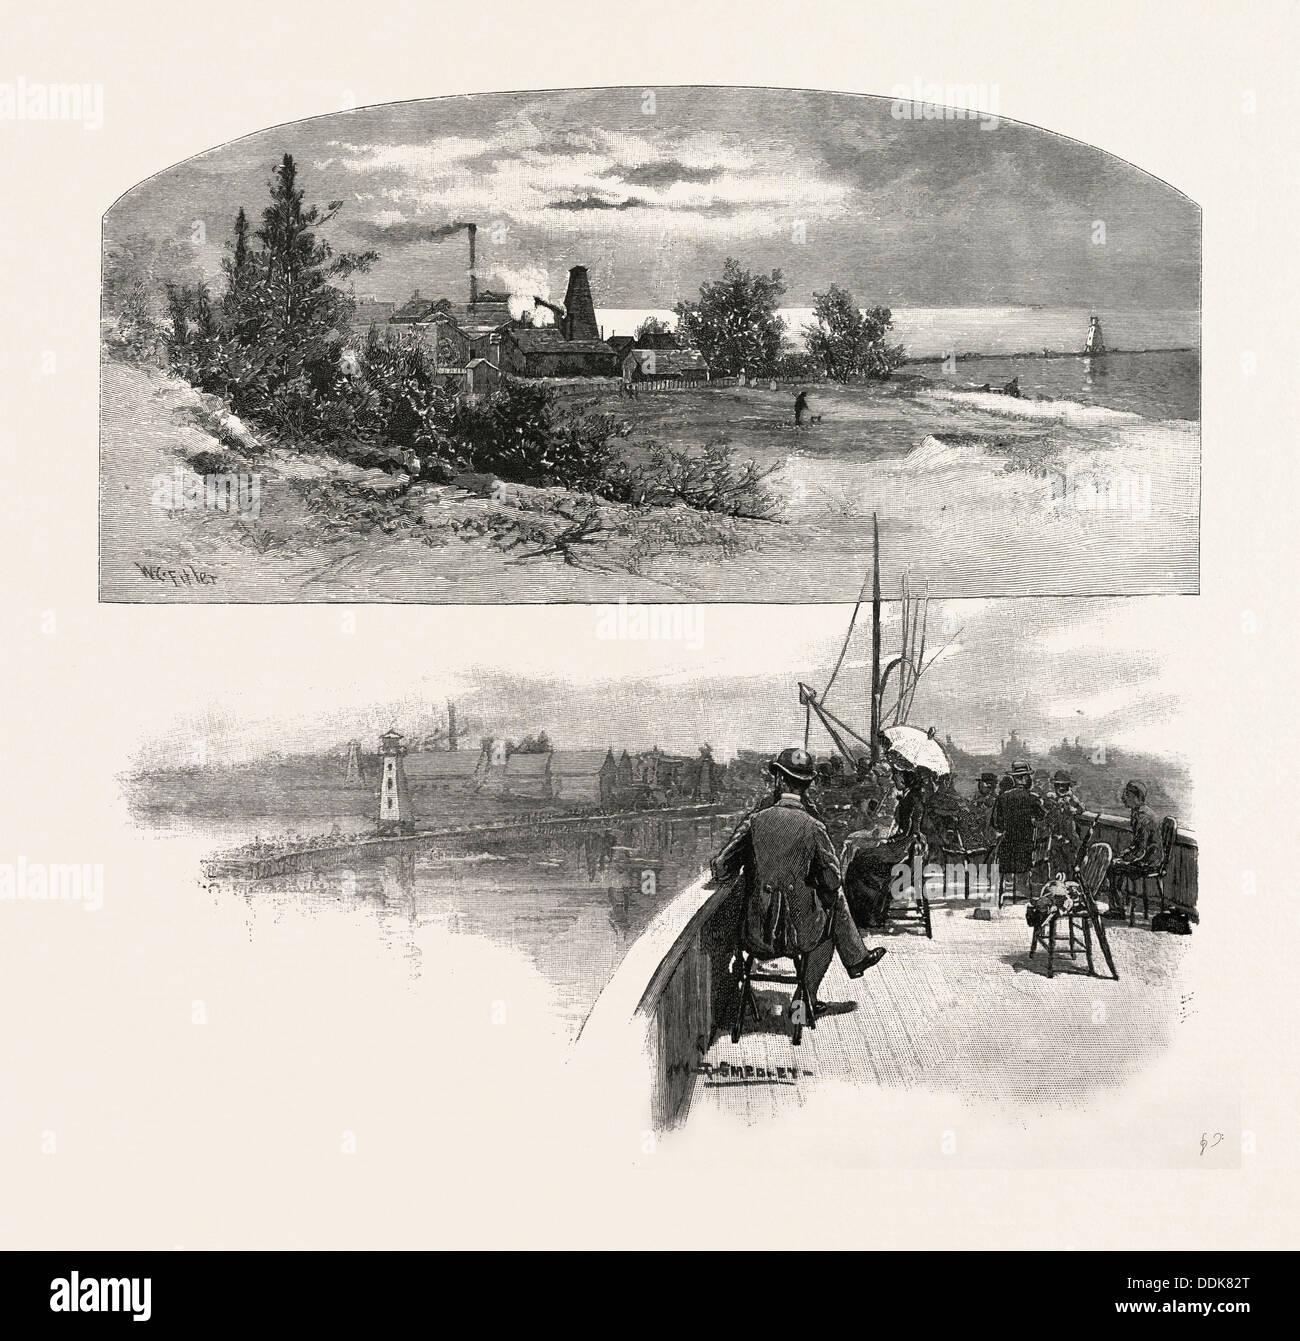 AT KINCARDINE, CANADA, NINETEENTH CENTURY ENGRAVING - Stock Image